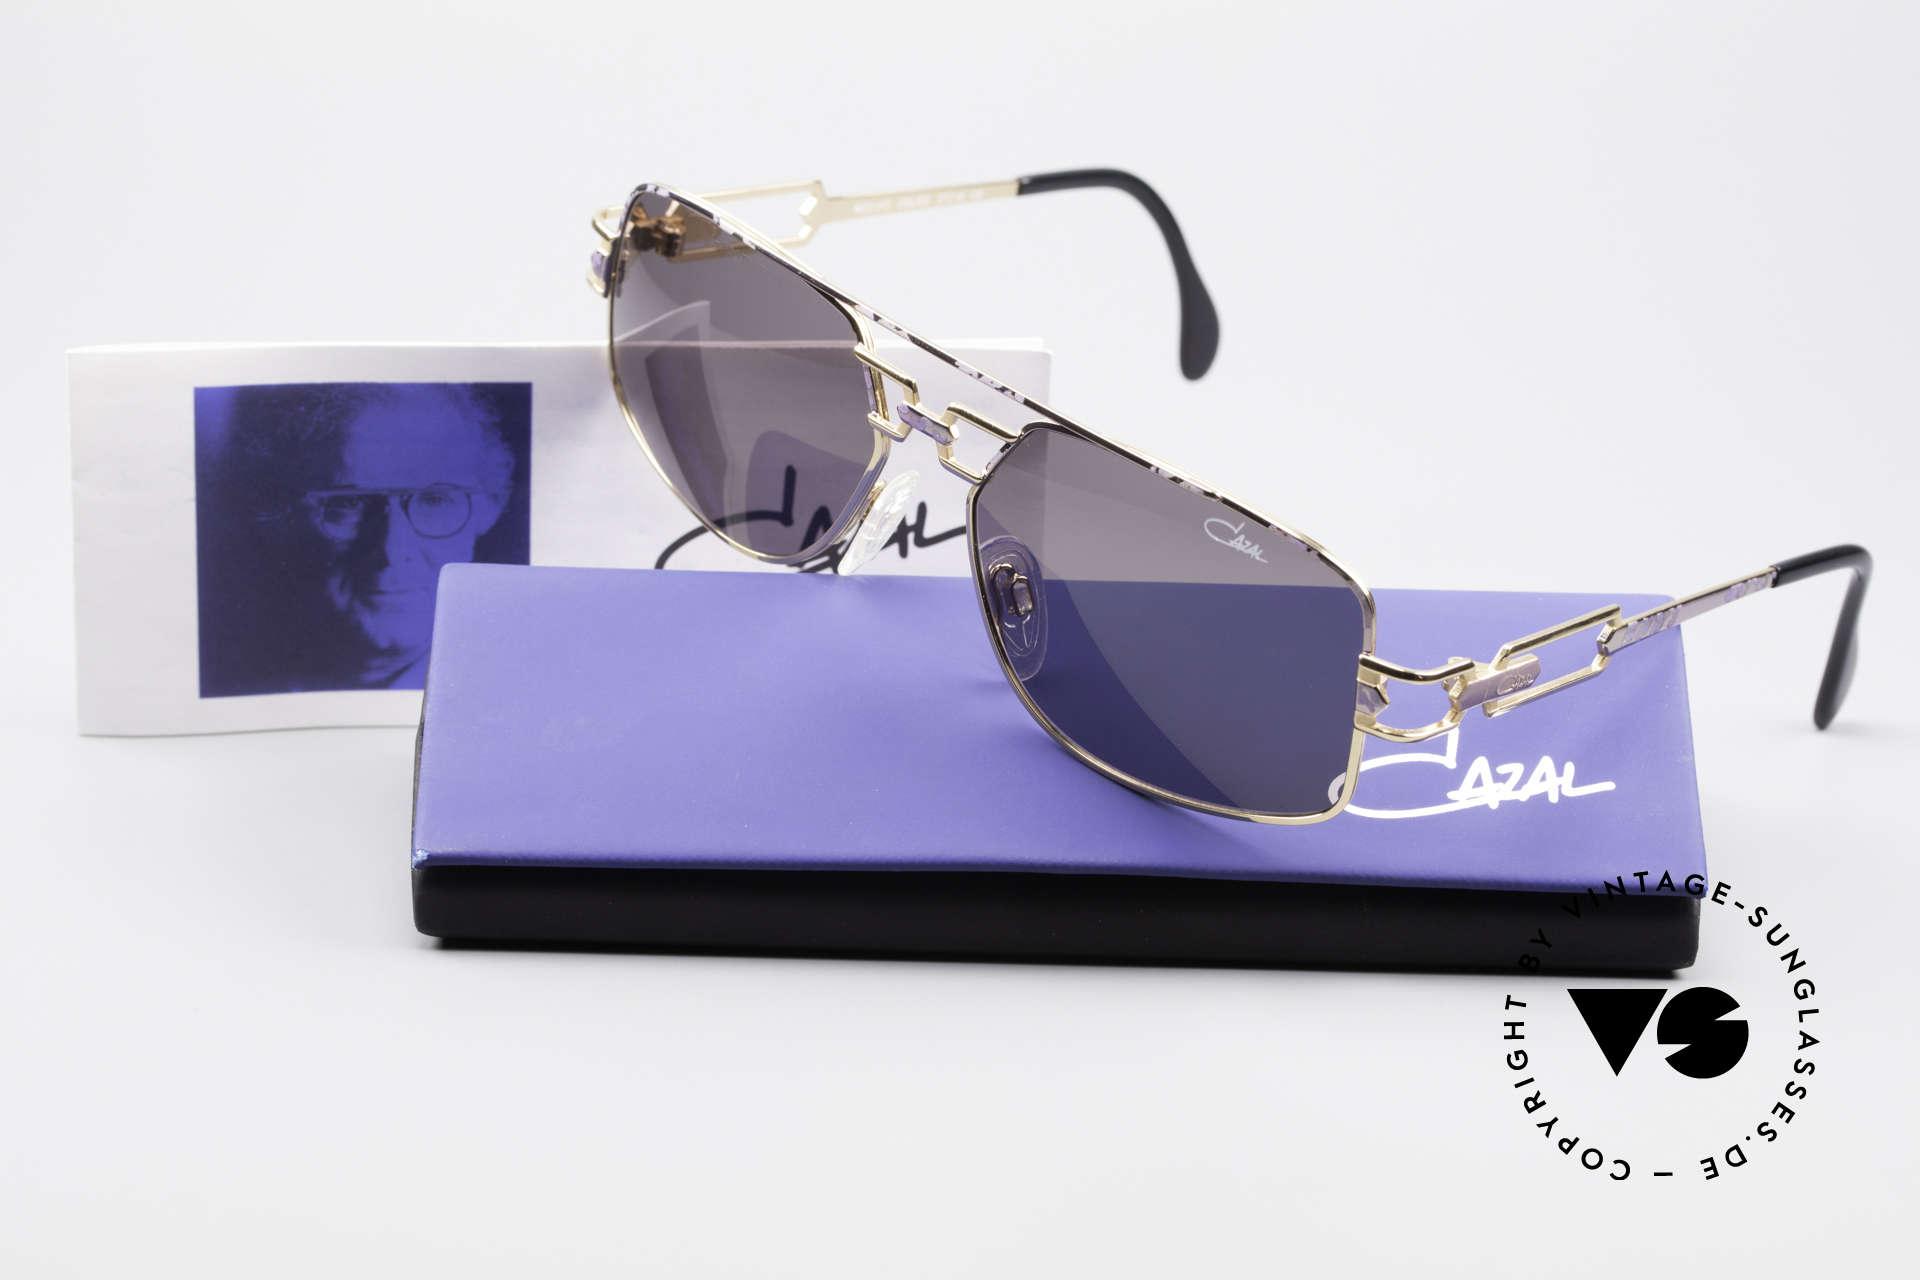 Cazal 972 True Vintage Shades No Retro, orig. gray CAZAL sun lenses with UV PROTECTION mark, Made for Men and Women